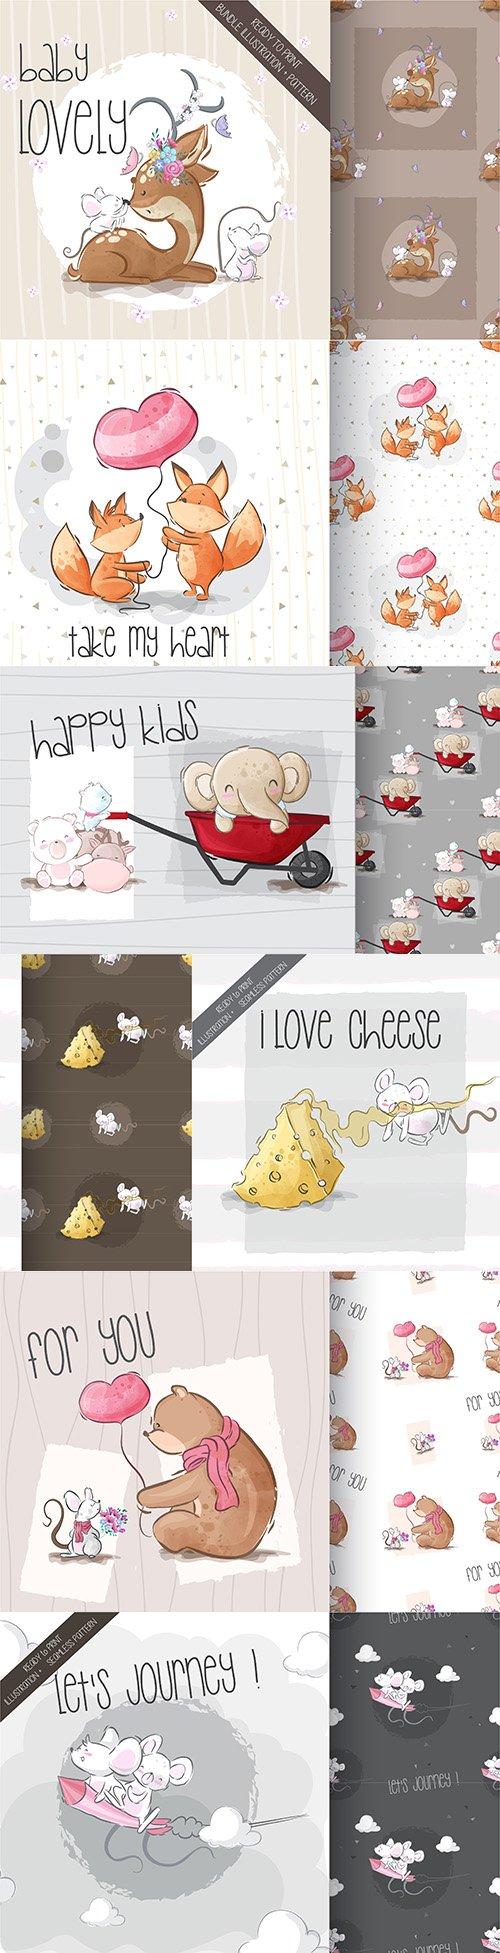 Funny animal cartoon characters design card 5